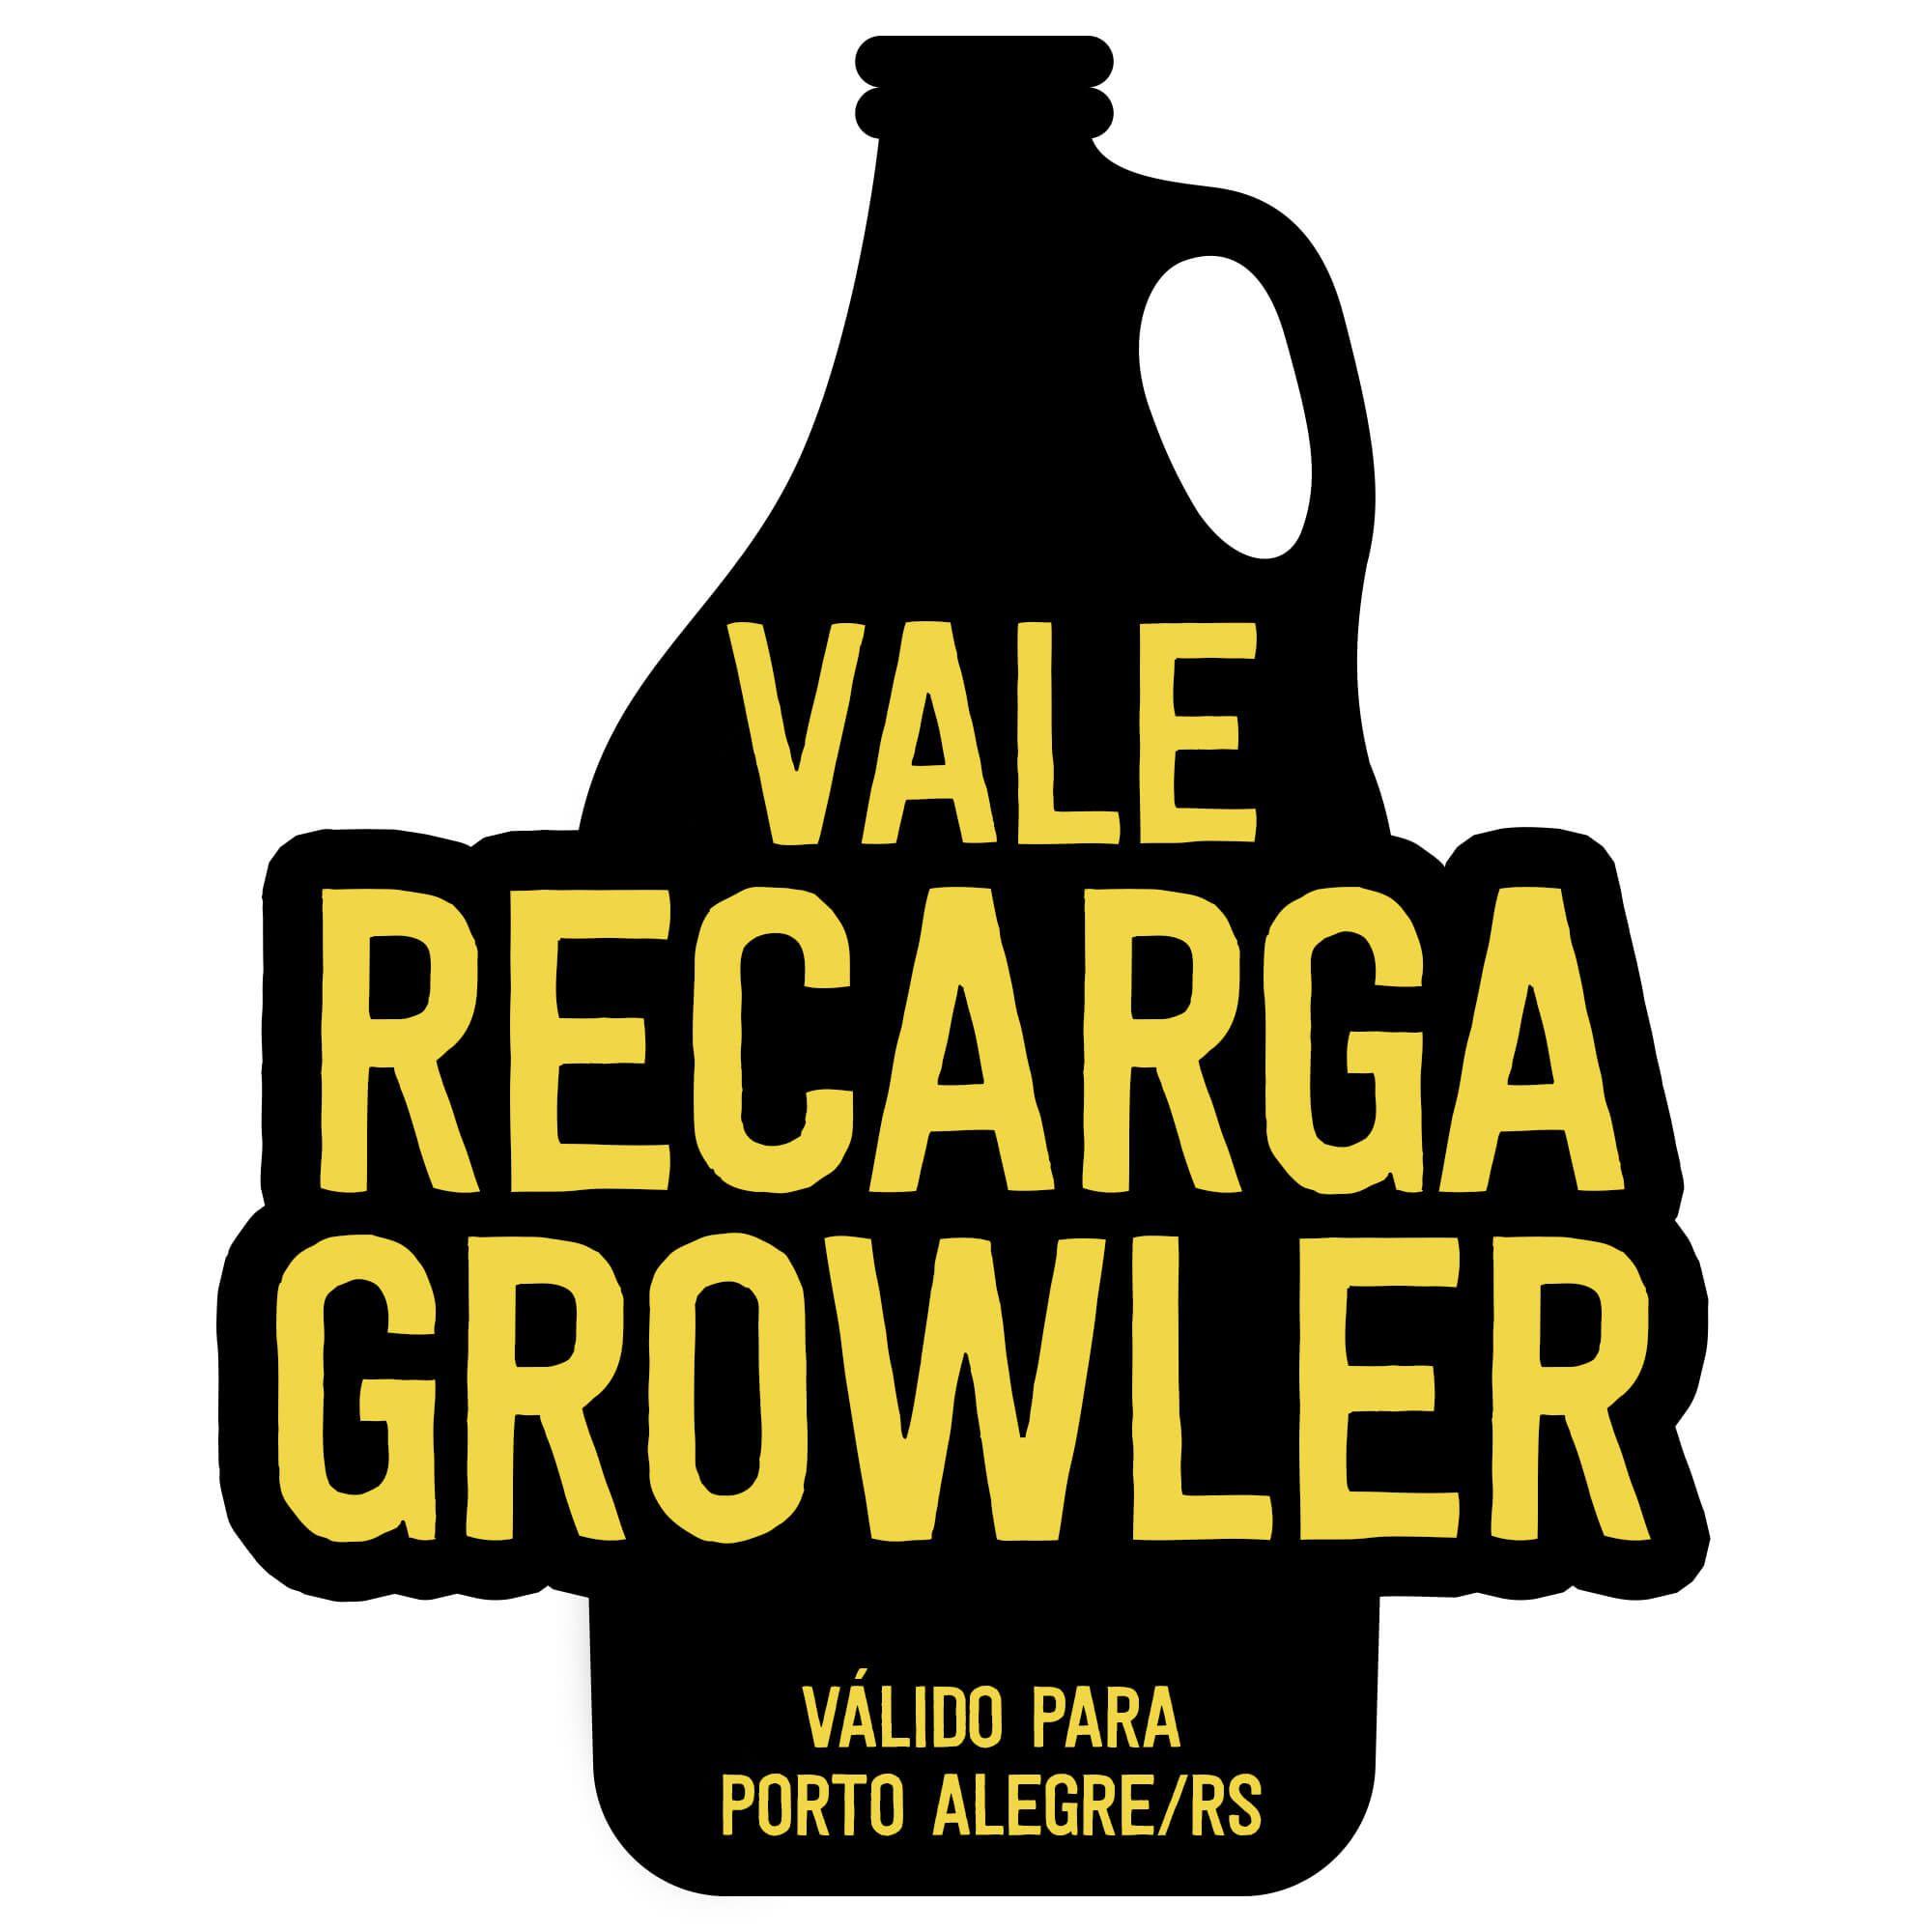 Kit Churrasco com Growler My Growler + Recarga